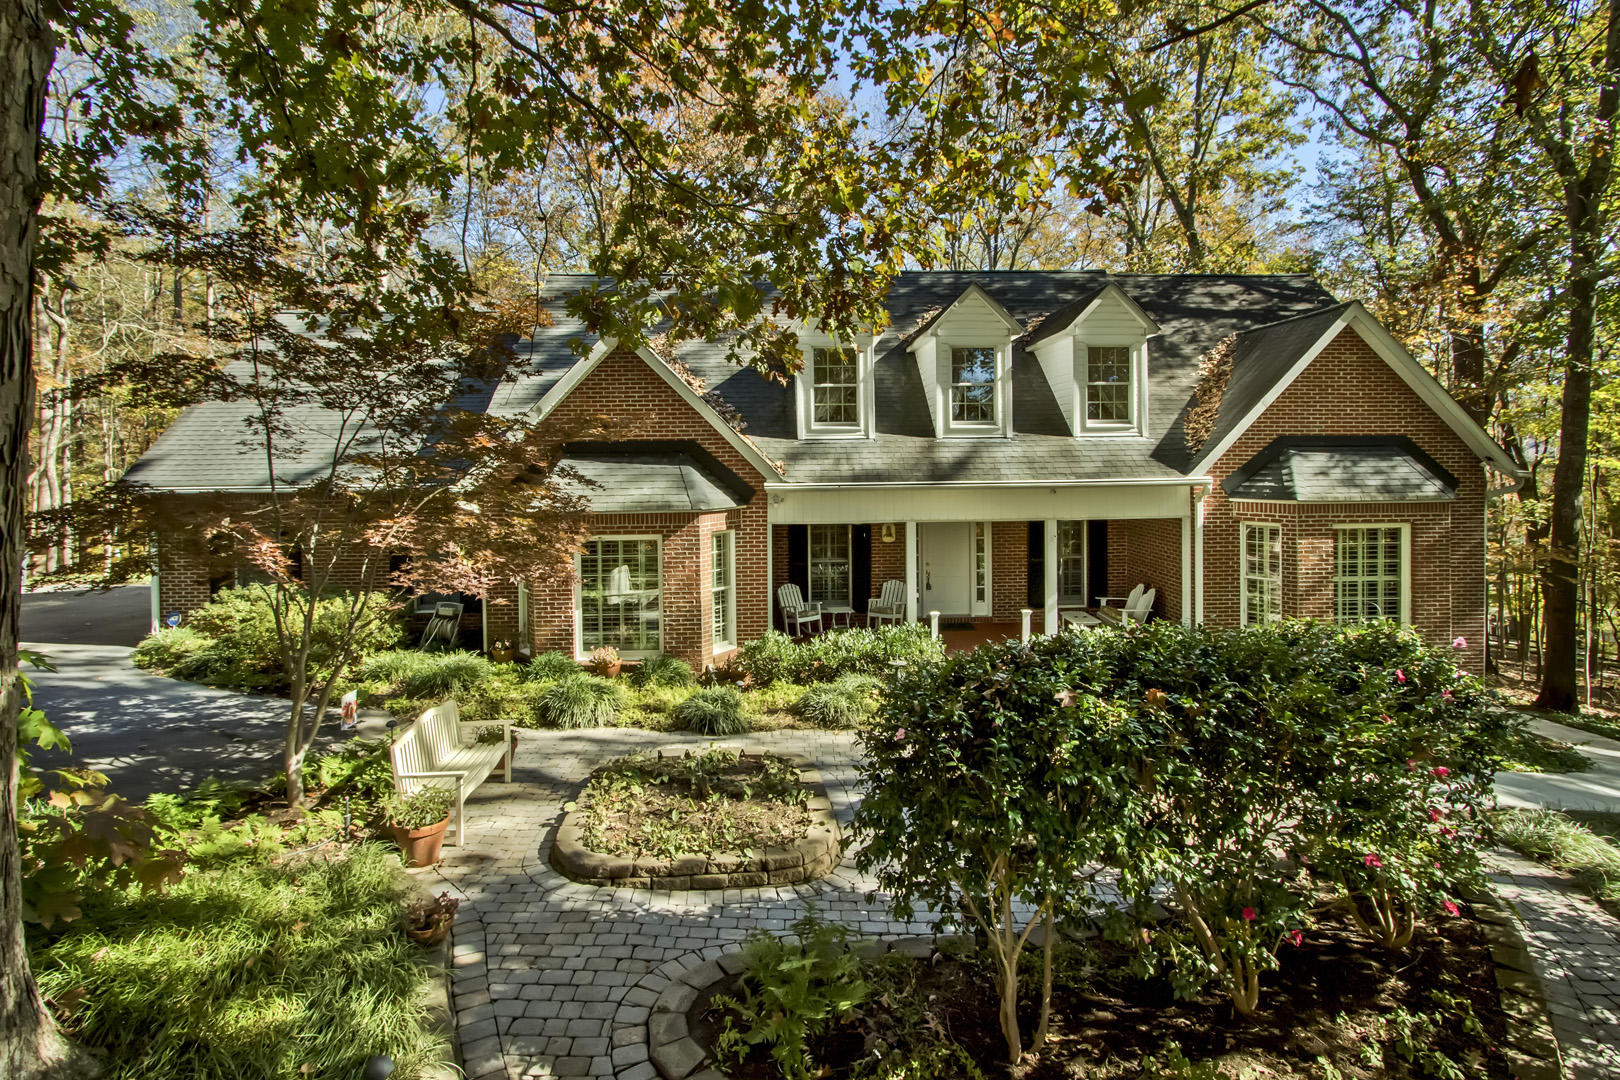 124 B Newport Drive, Oak Ridge, Tennessee, United States 37830, 4 Bedrooms Bedrooms, ,3 BathroomsBathrooms,Single Family,For Sale,Newport Drive,1100596